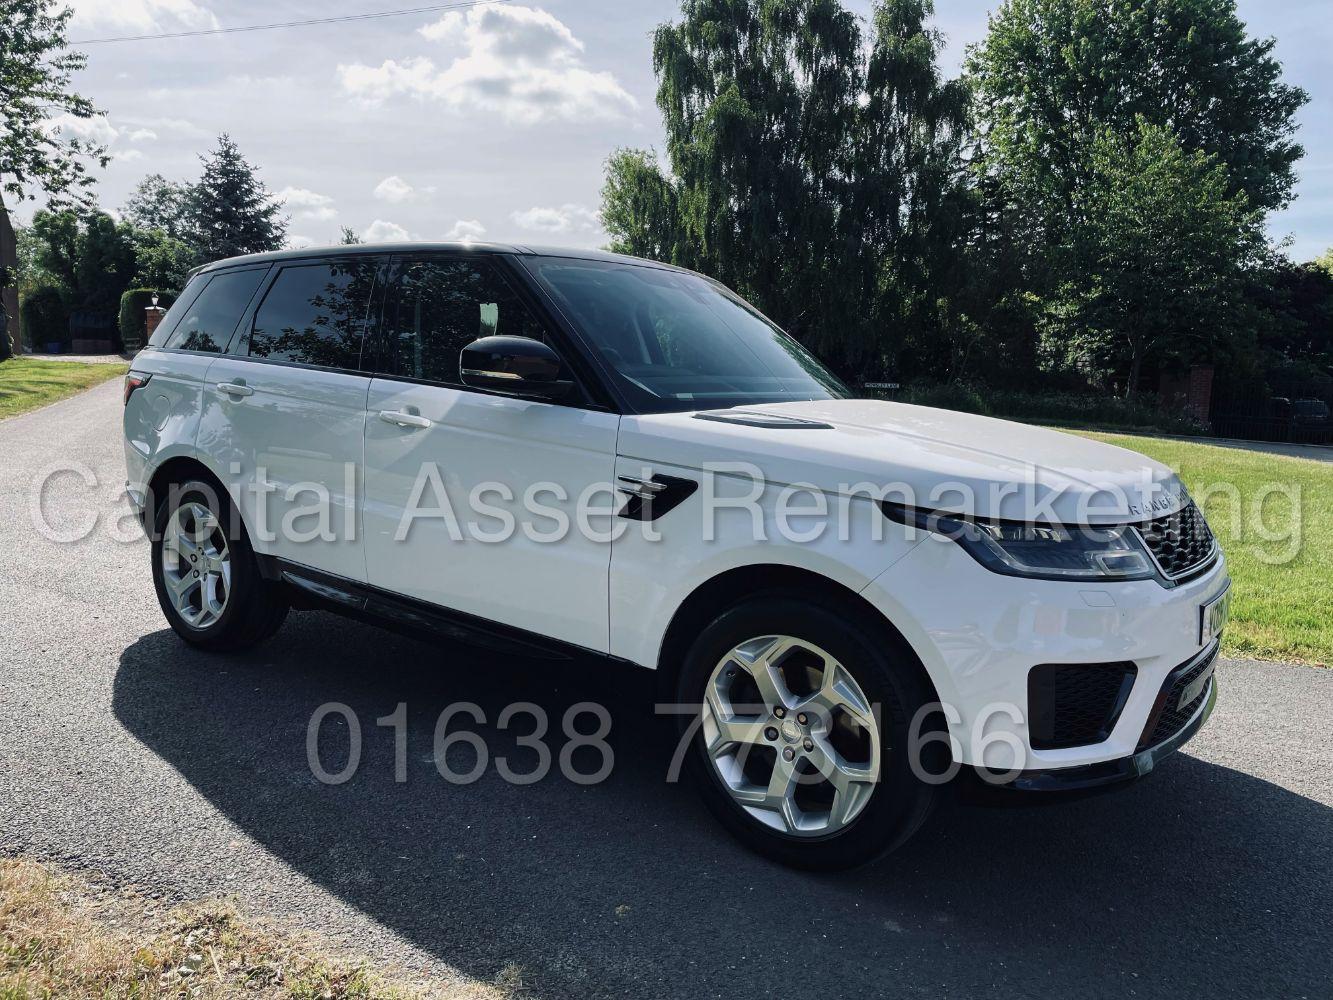 2021 Rolex Datejust 41MM - 2018 Range Rover Sport *HSE* - 2019 Mercedes-Benz C220d *Sport Edition* + Many More: Cars, Commercials & 4x4's